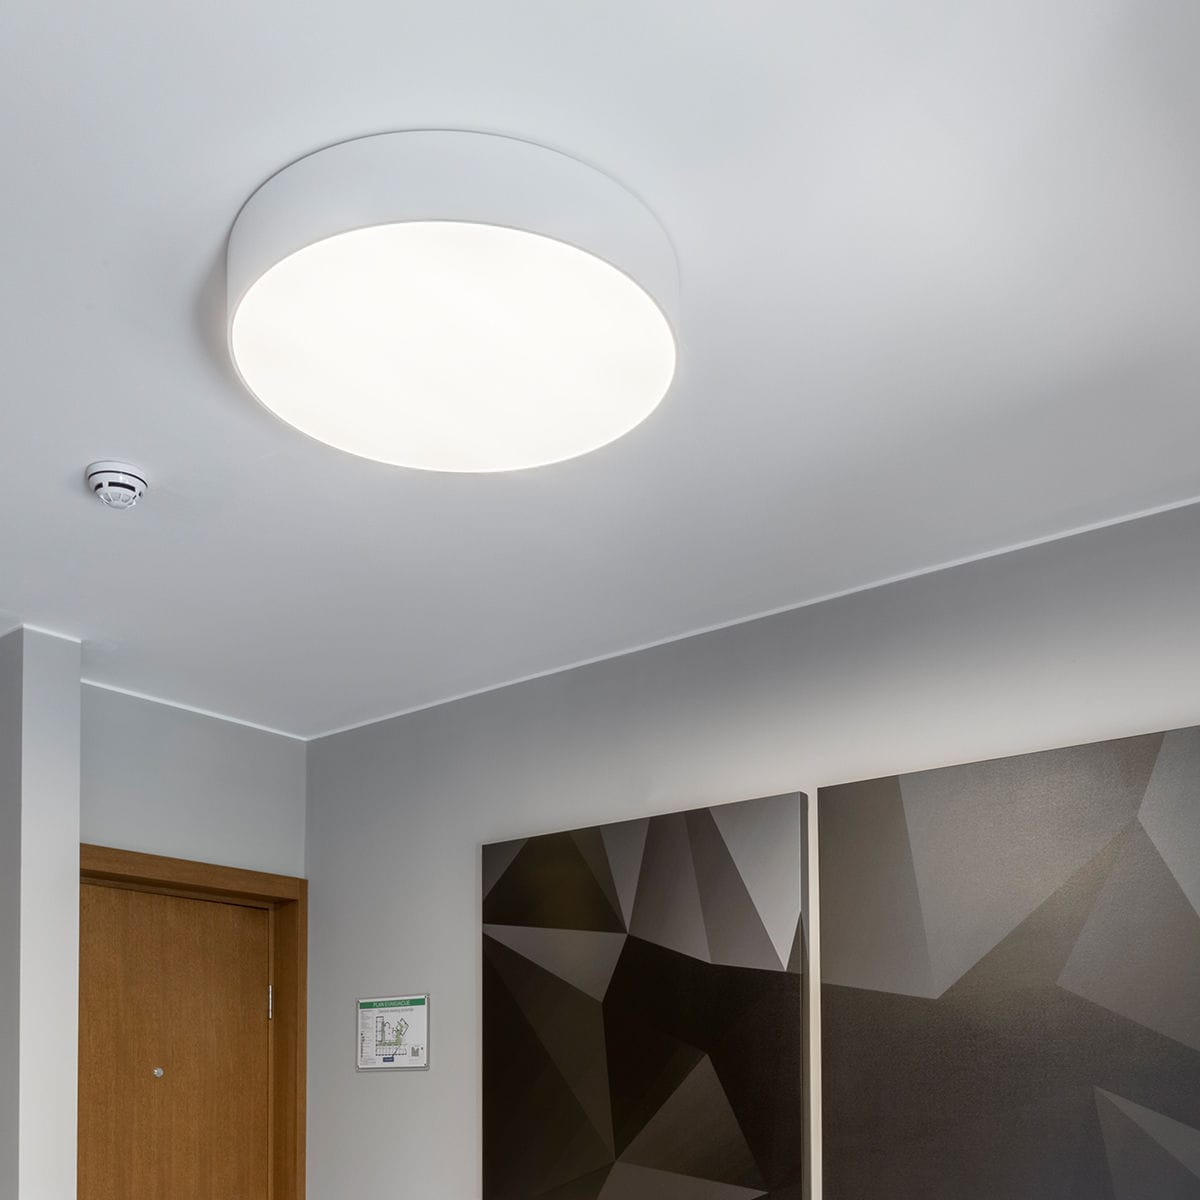 Surface mounted light fixture led fluorescent round luna cdp surface mounted light fixture led fluorescent round luna cdp c arubaitofo Choice Image